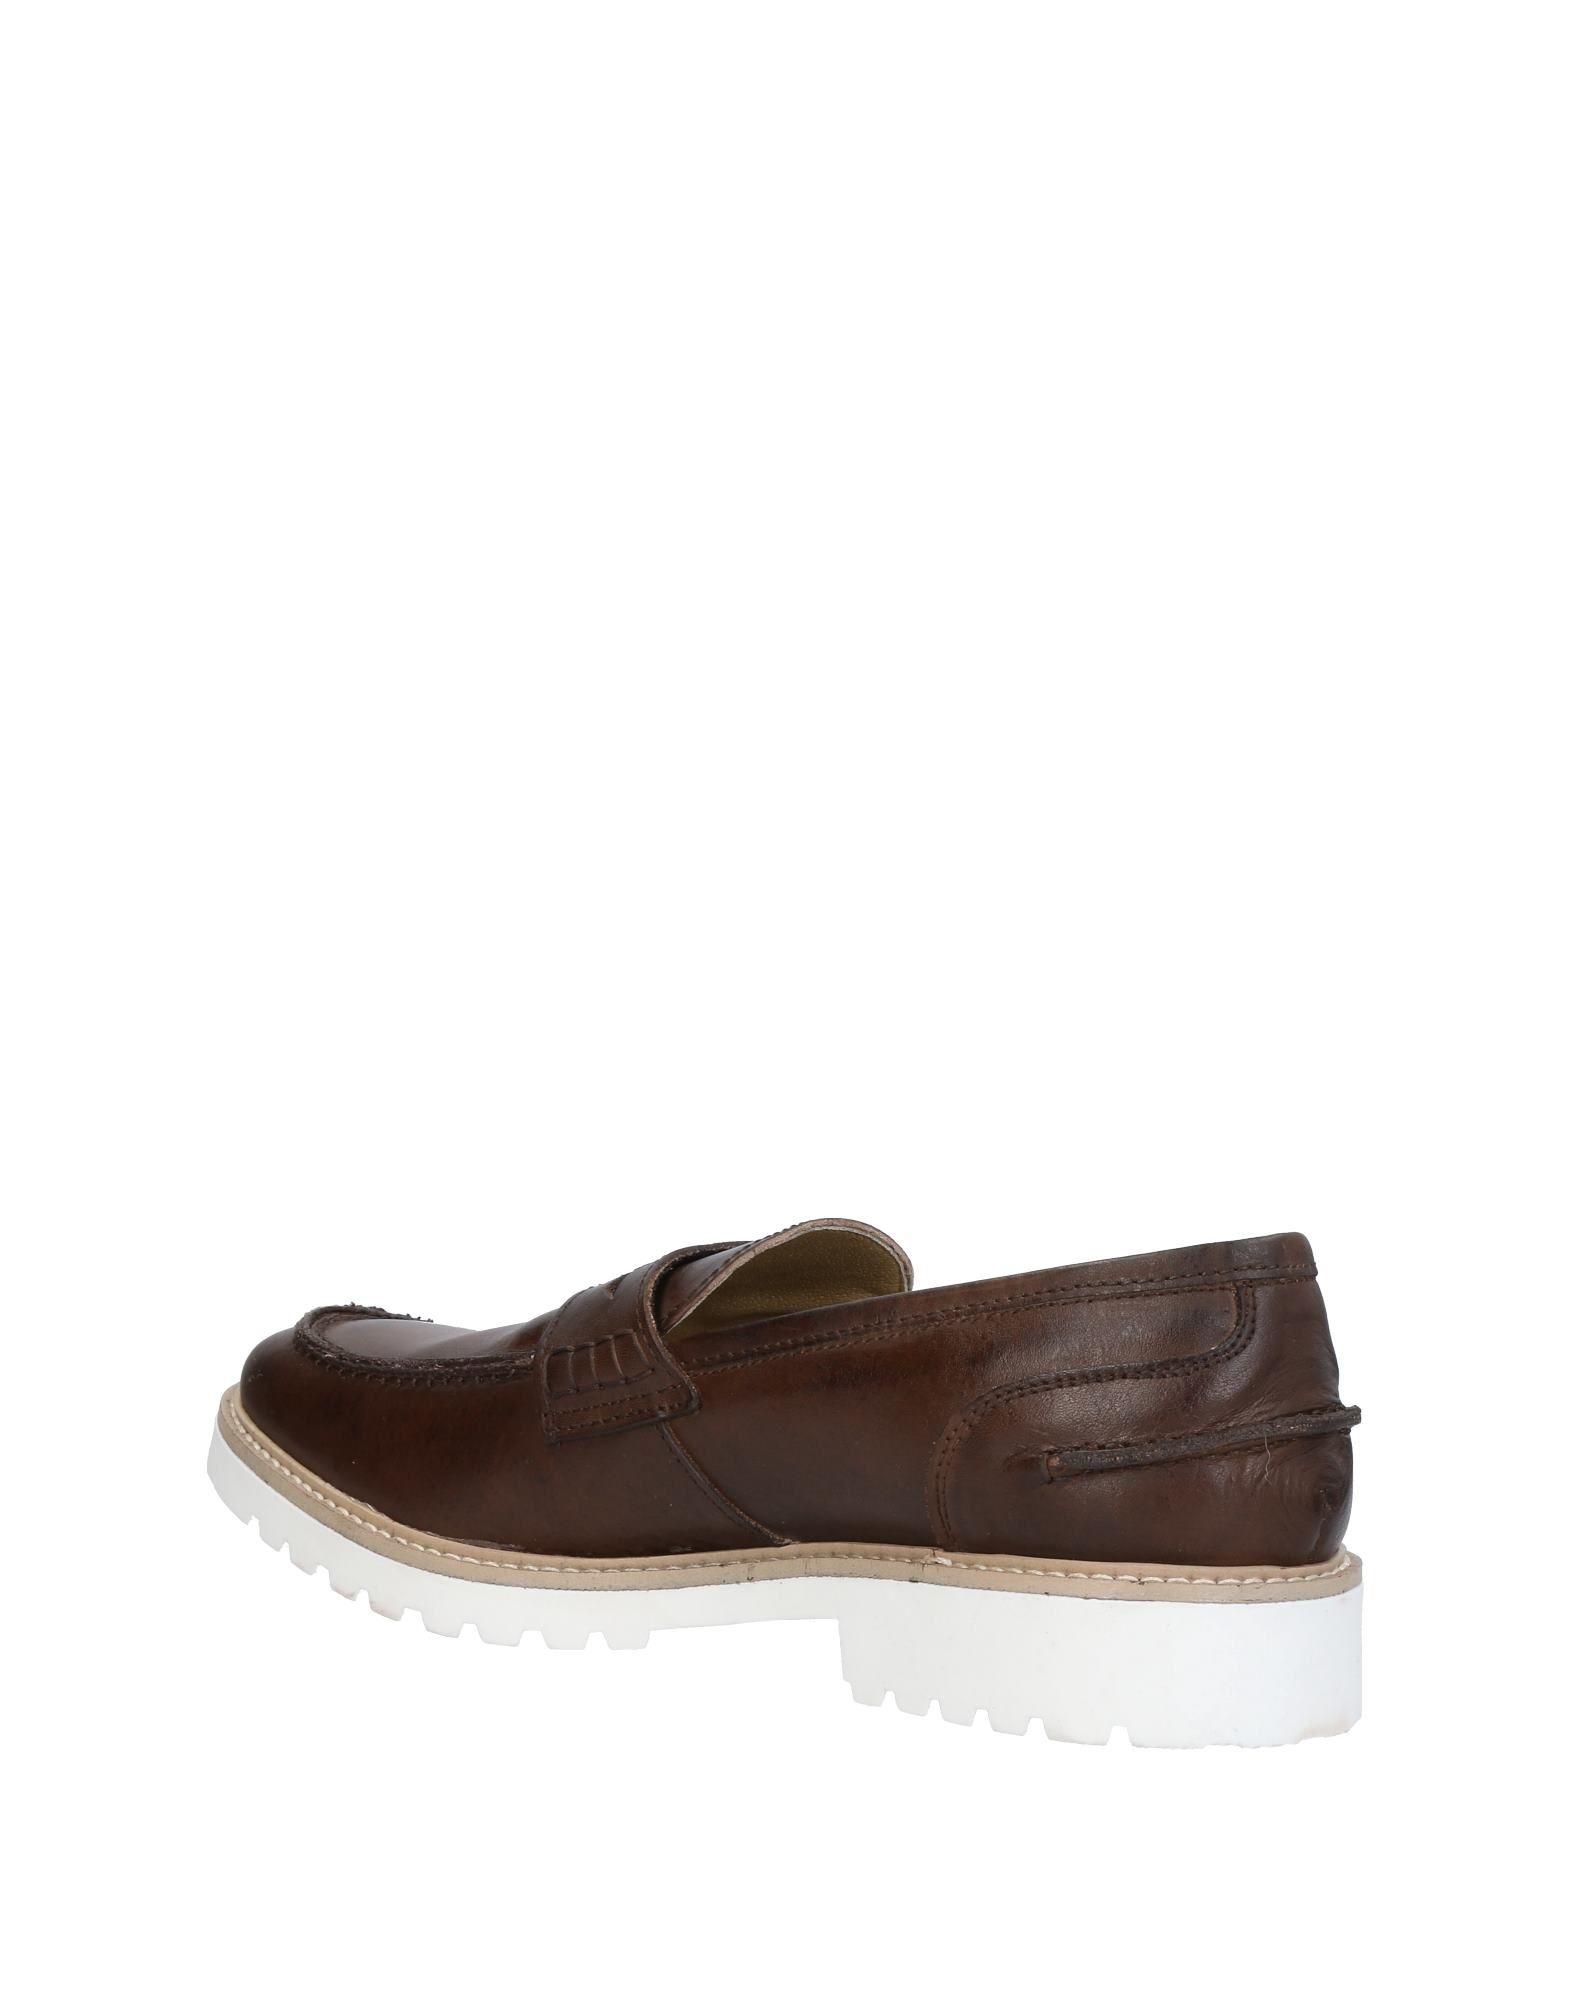 Chaussures Waldläufer bleues Fashion femme v0PjW0